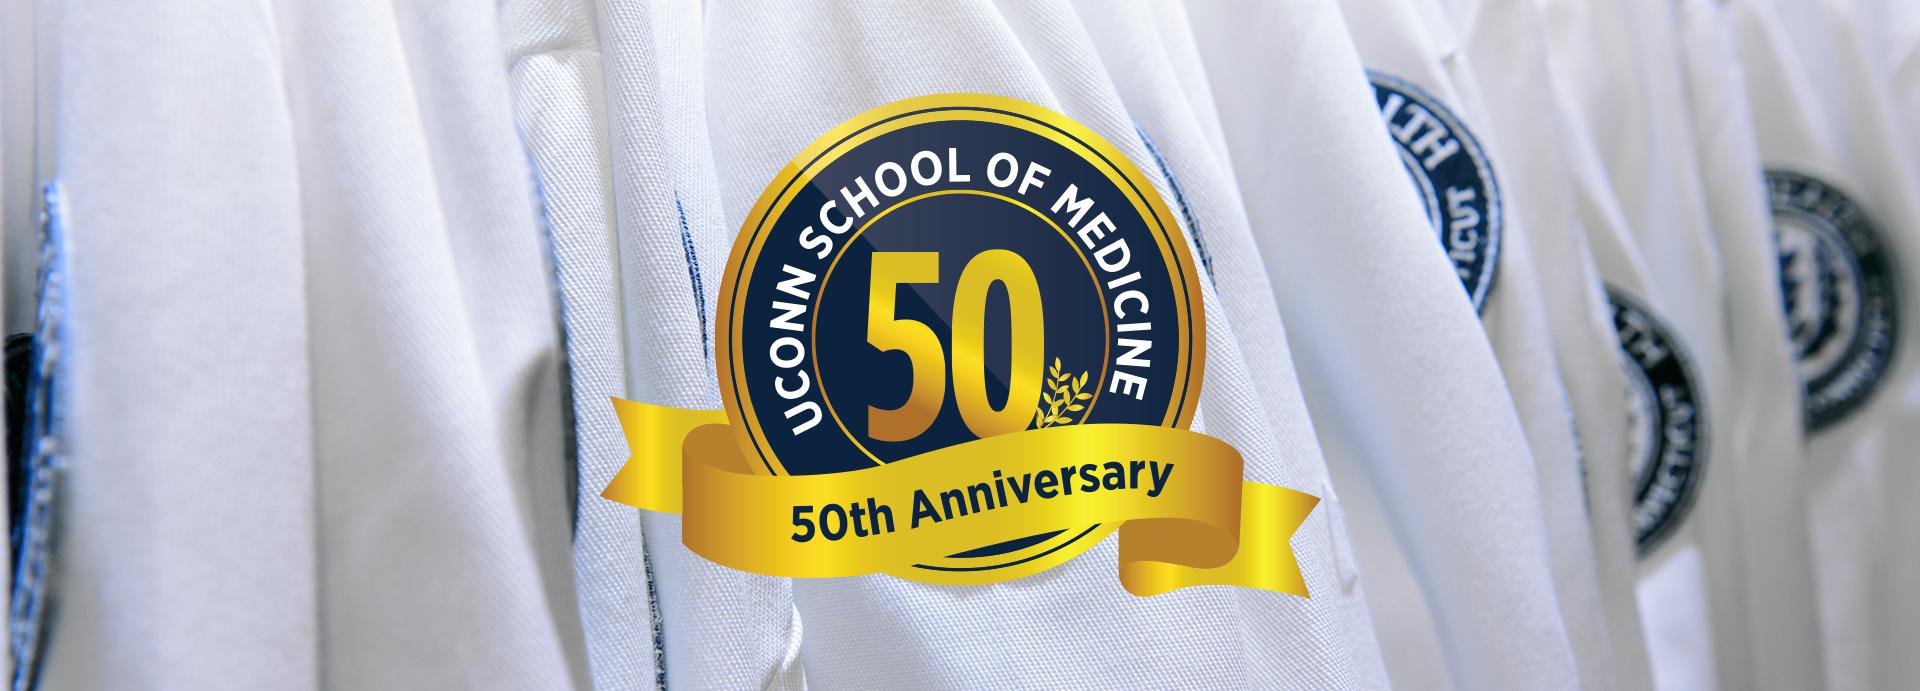 50th anniversary seal overtop whitecoats - UConn School of Medicine